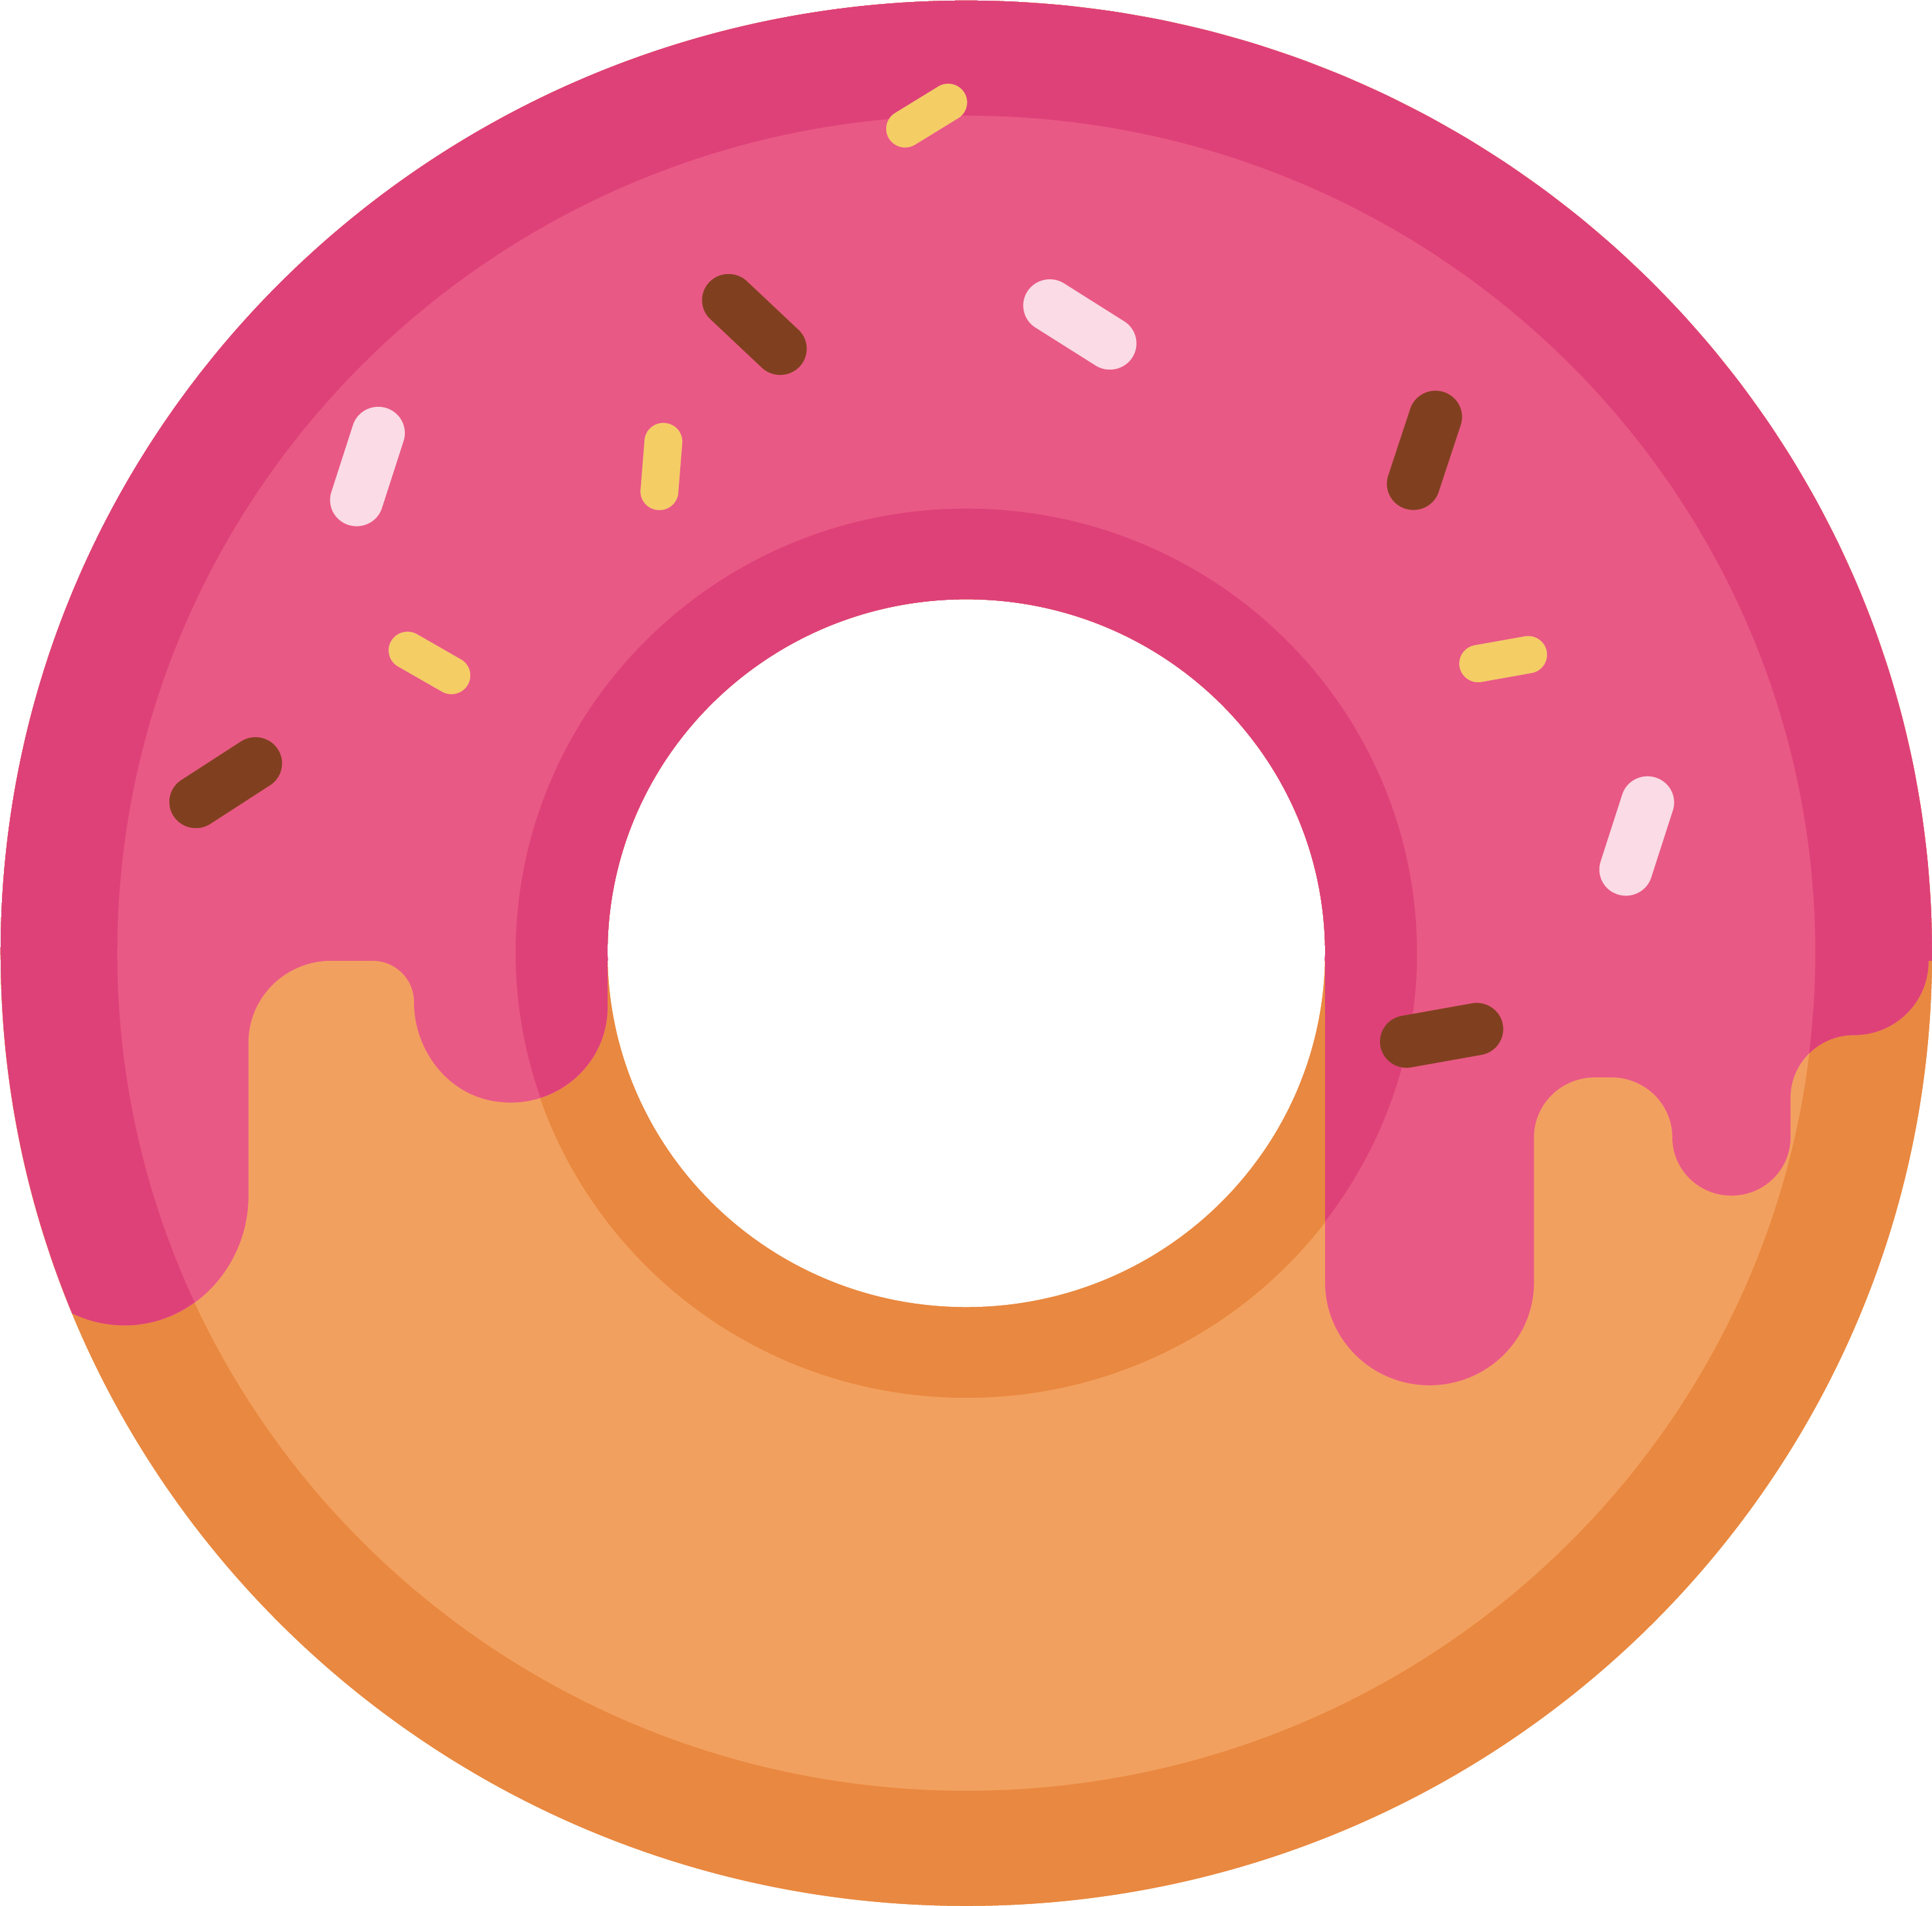 clip art library library Doughnut drawing dessert icon. Vector donut cartoon strawberry